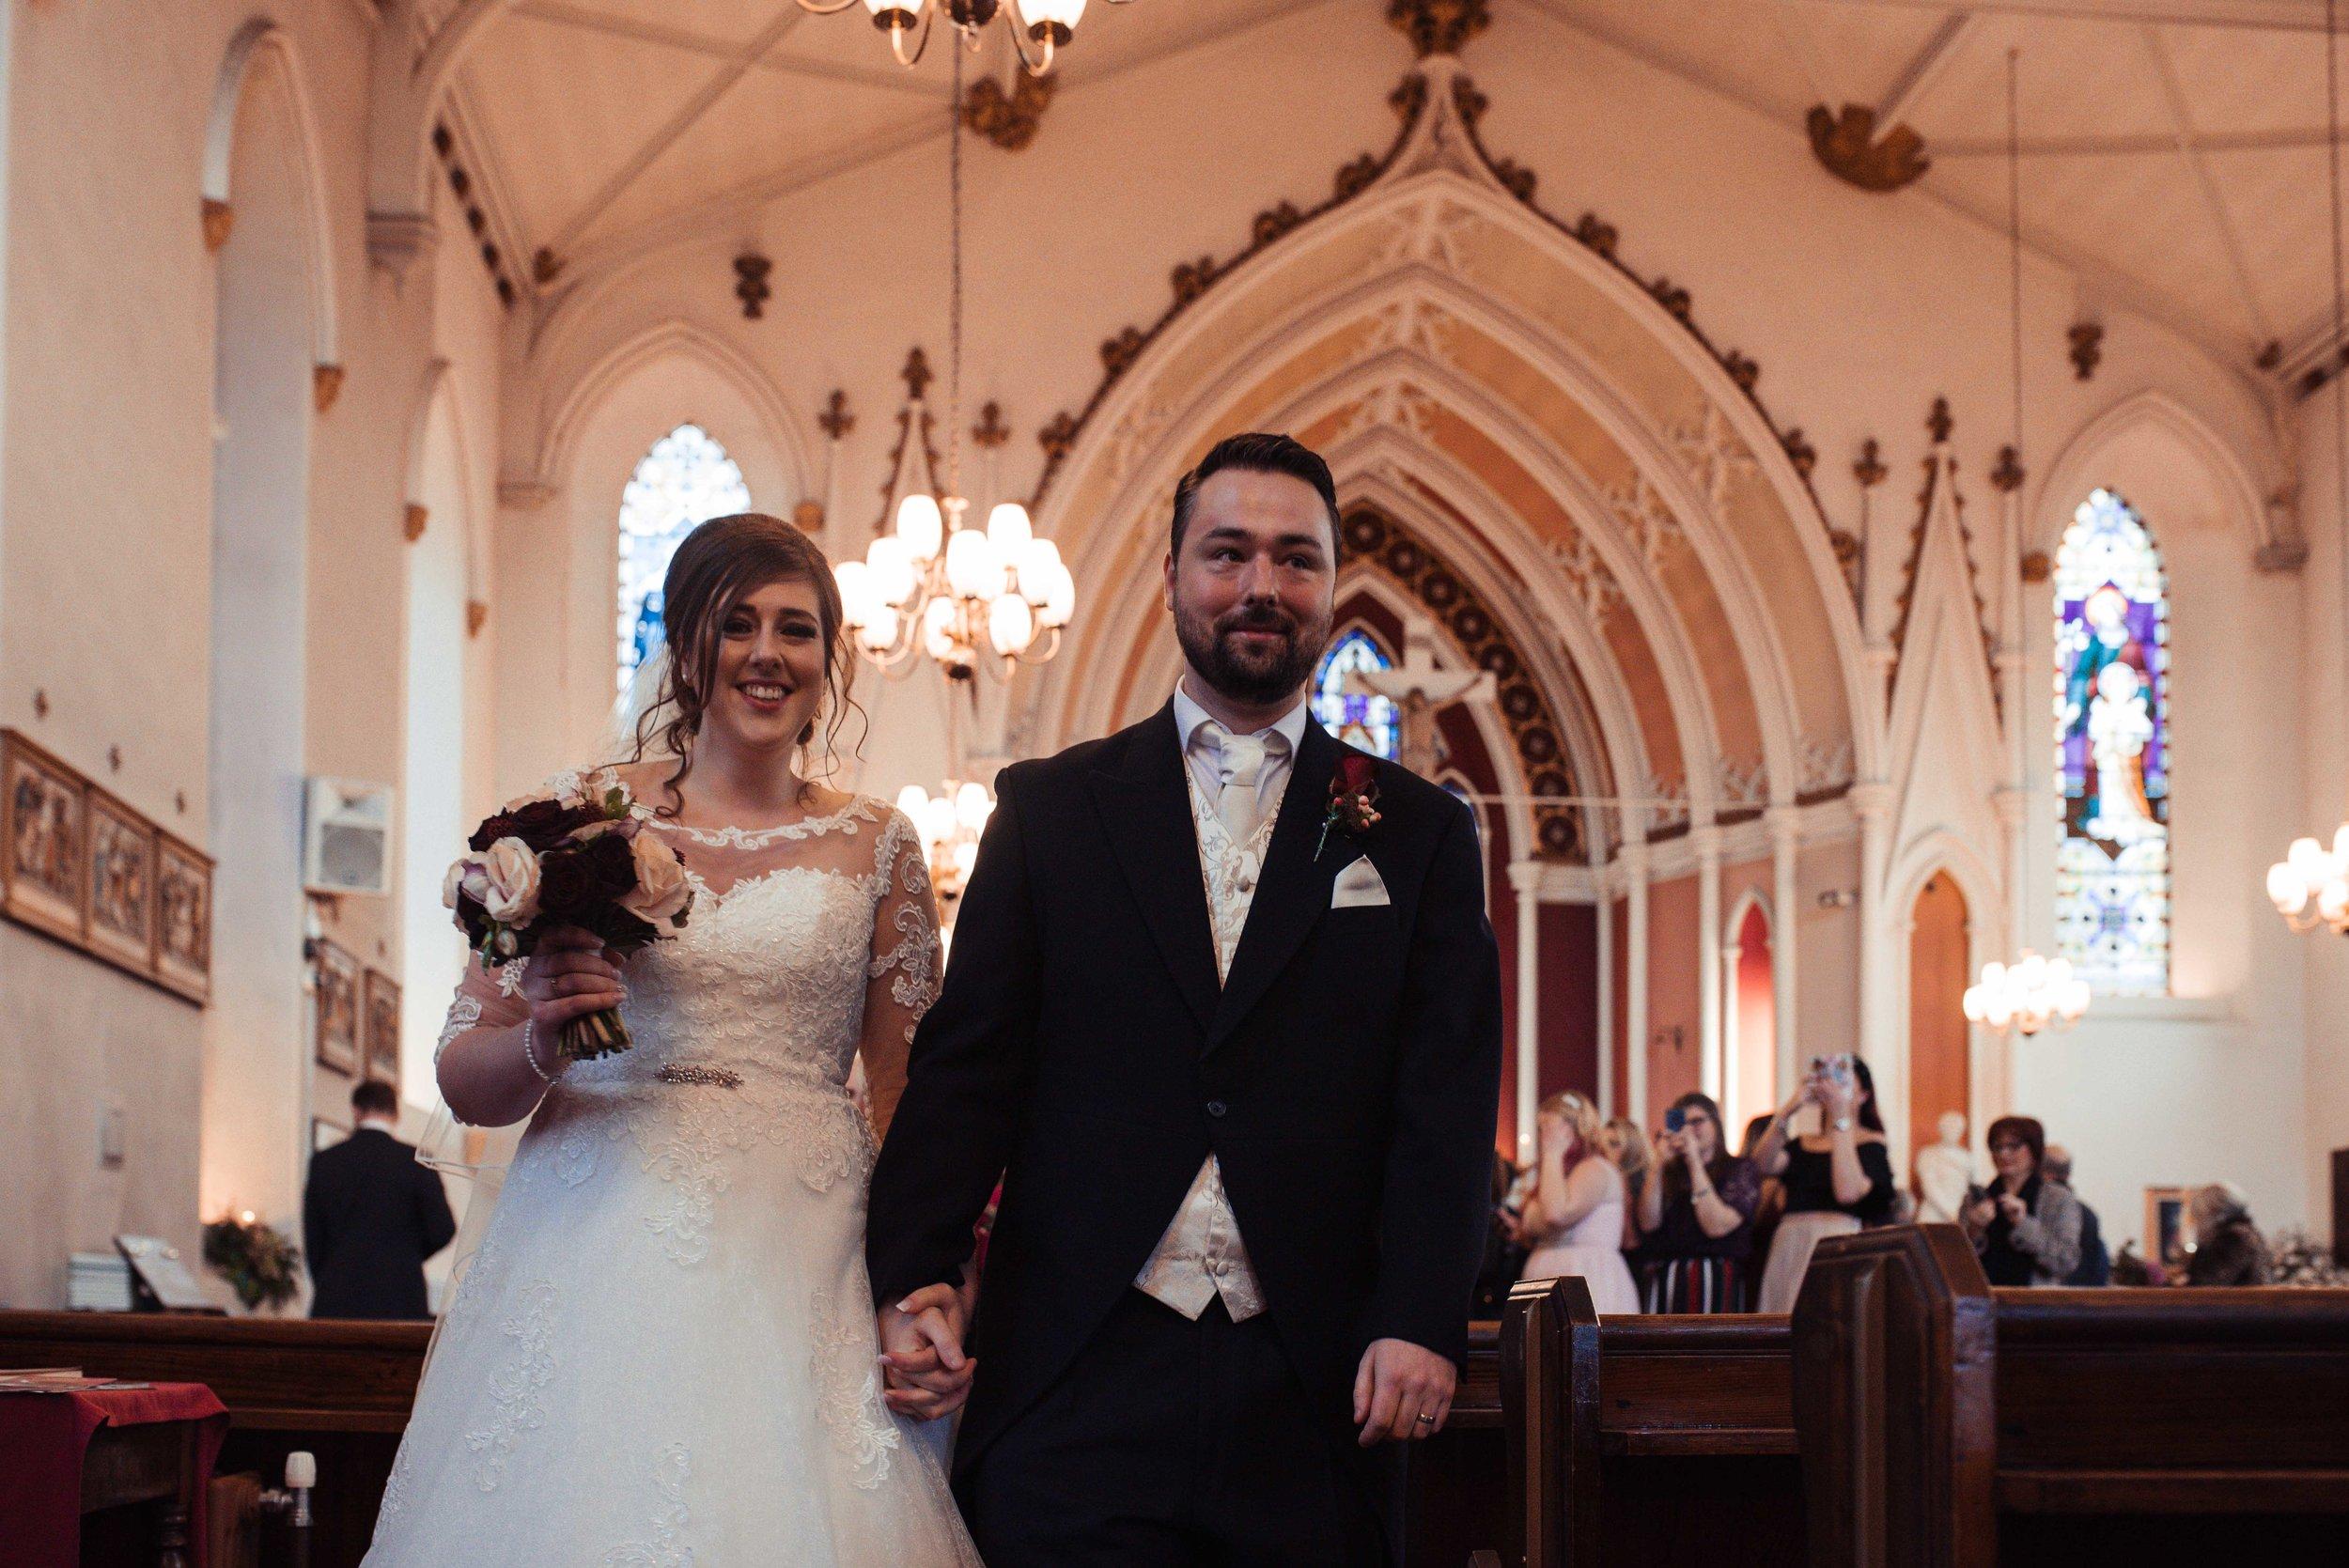 Belsfield-wedding-photography-18.jpg